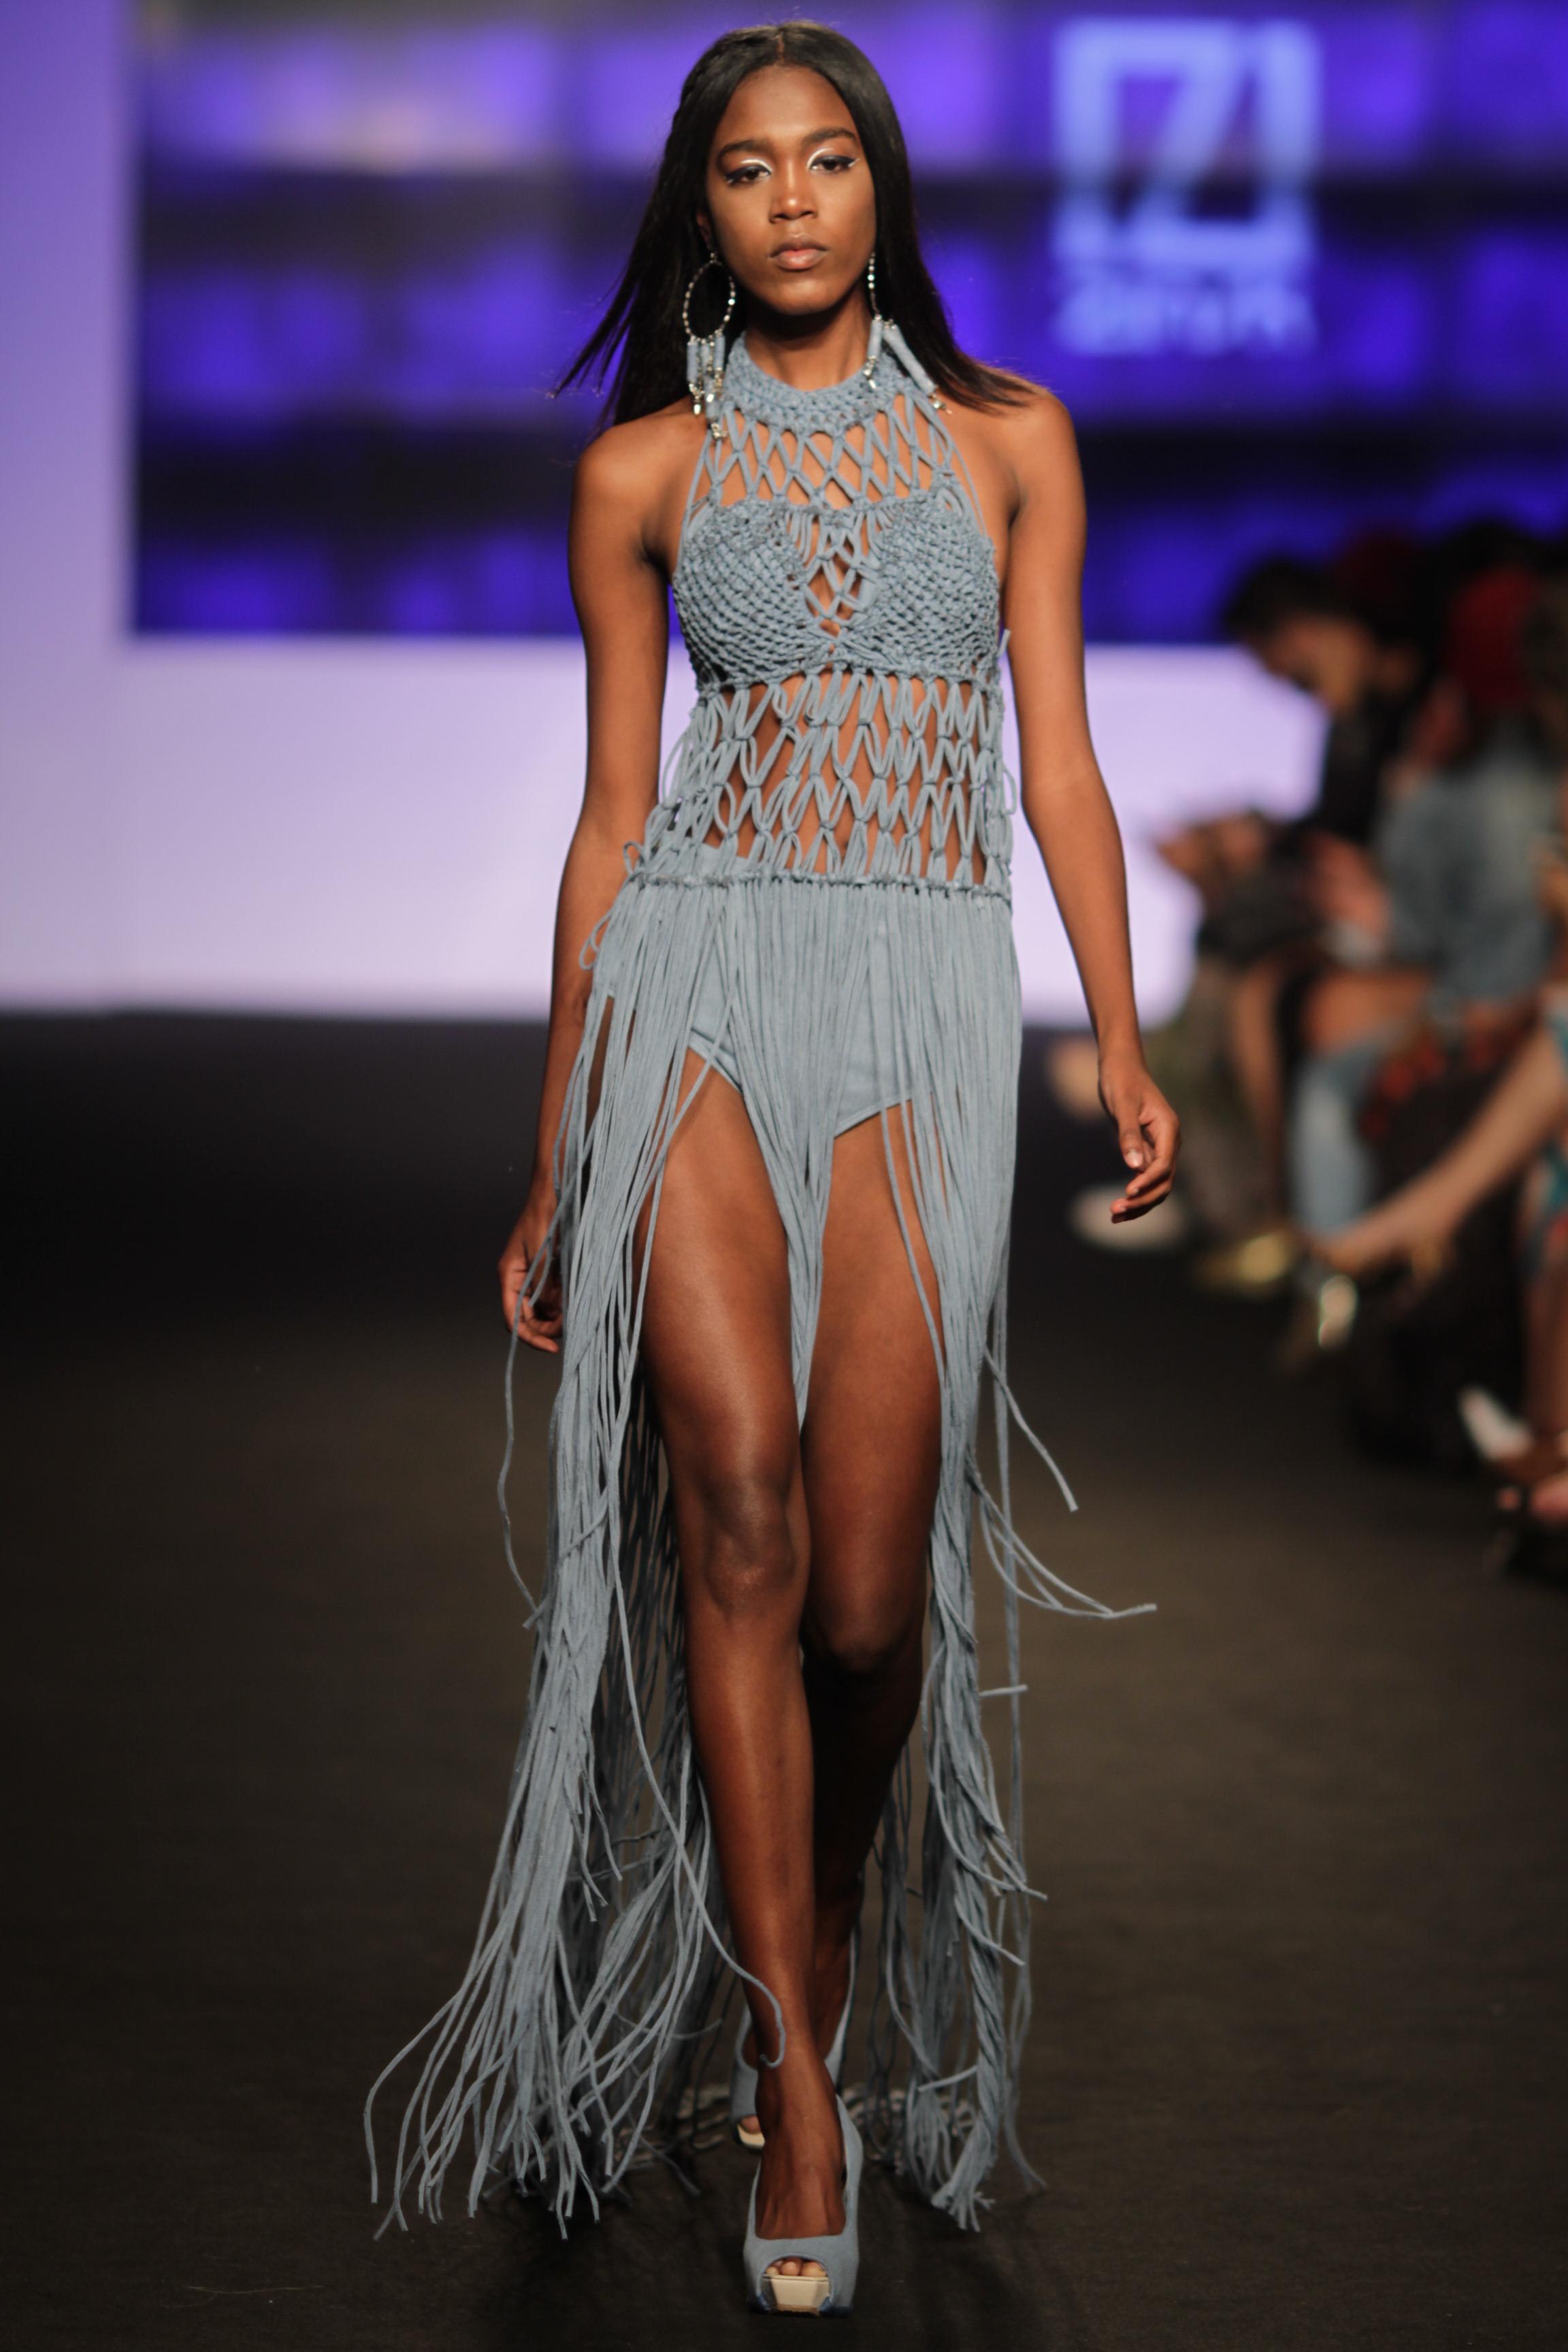 Zinsk se inspira no mundo contempor neo no vit ria moda for Estilo contemporaneo moda